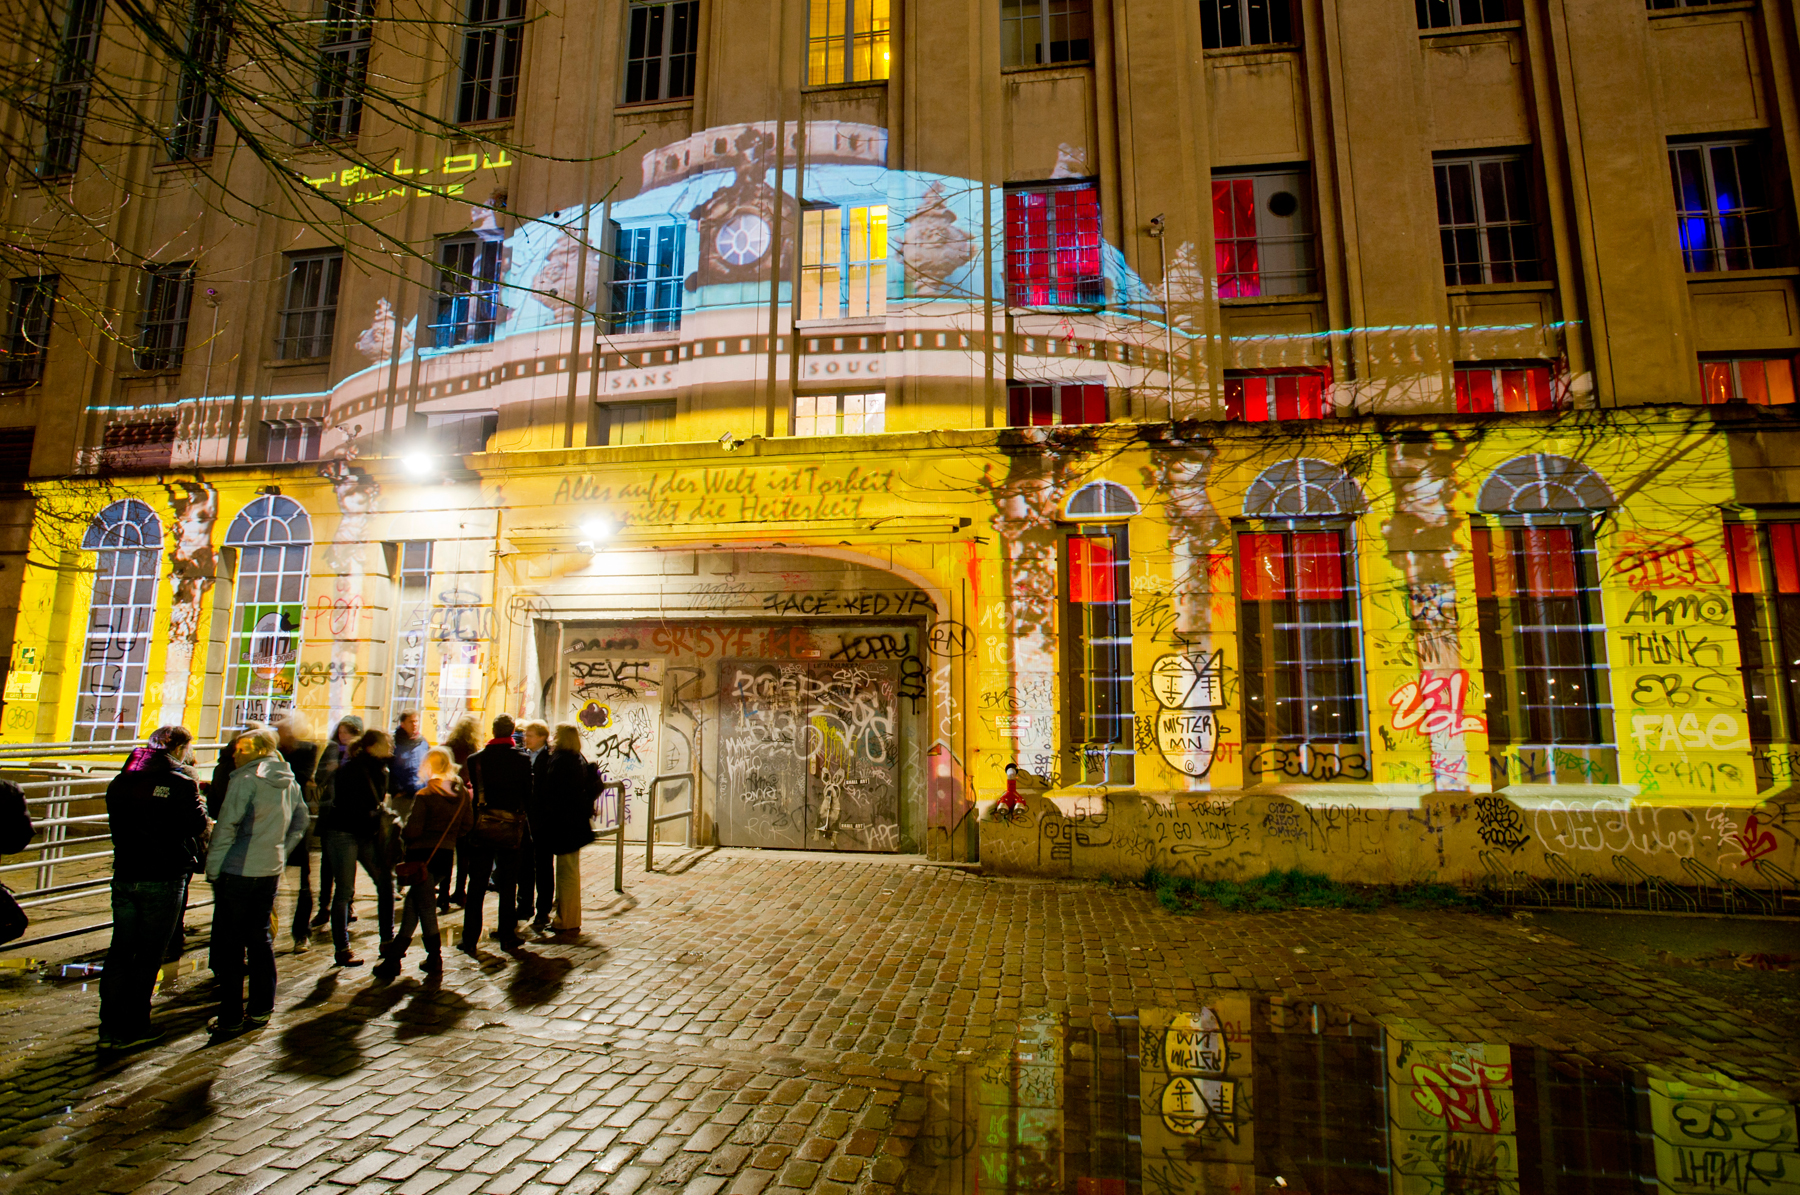 gratis date sider sex party i berlin